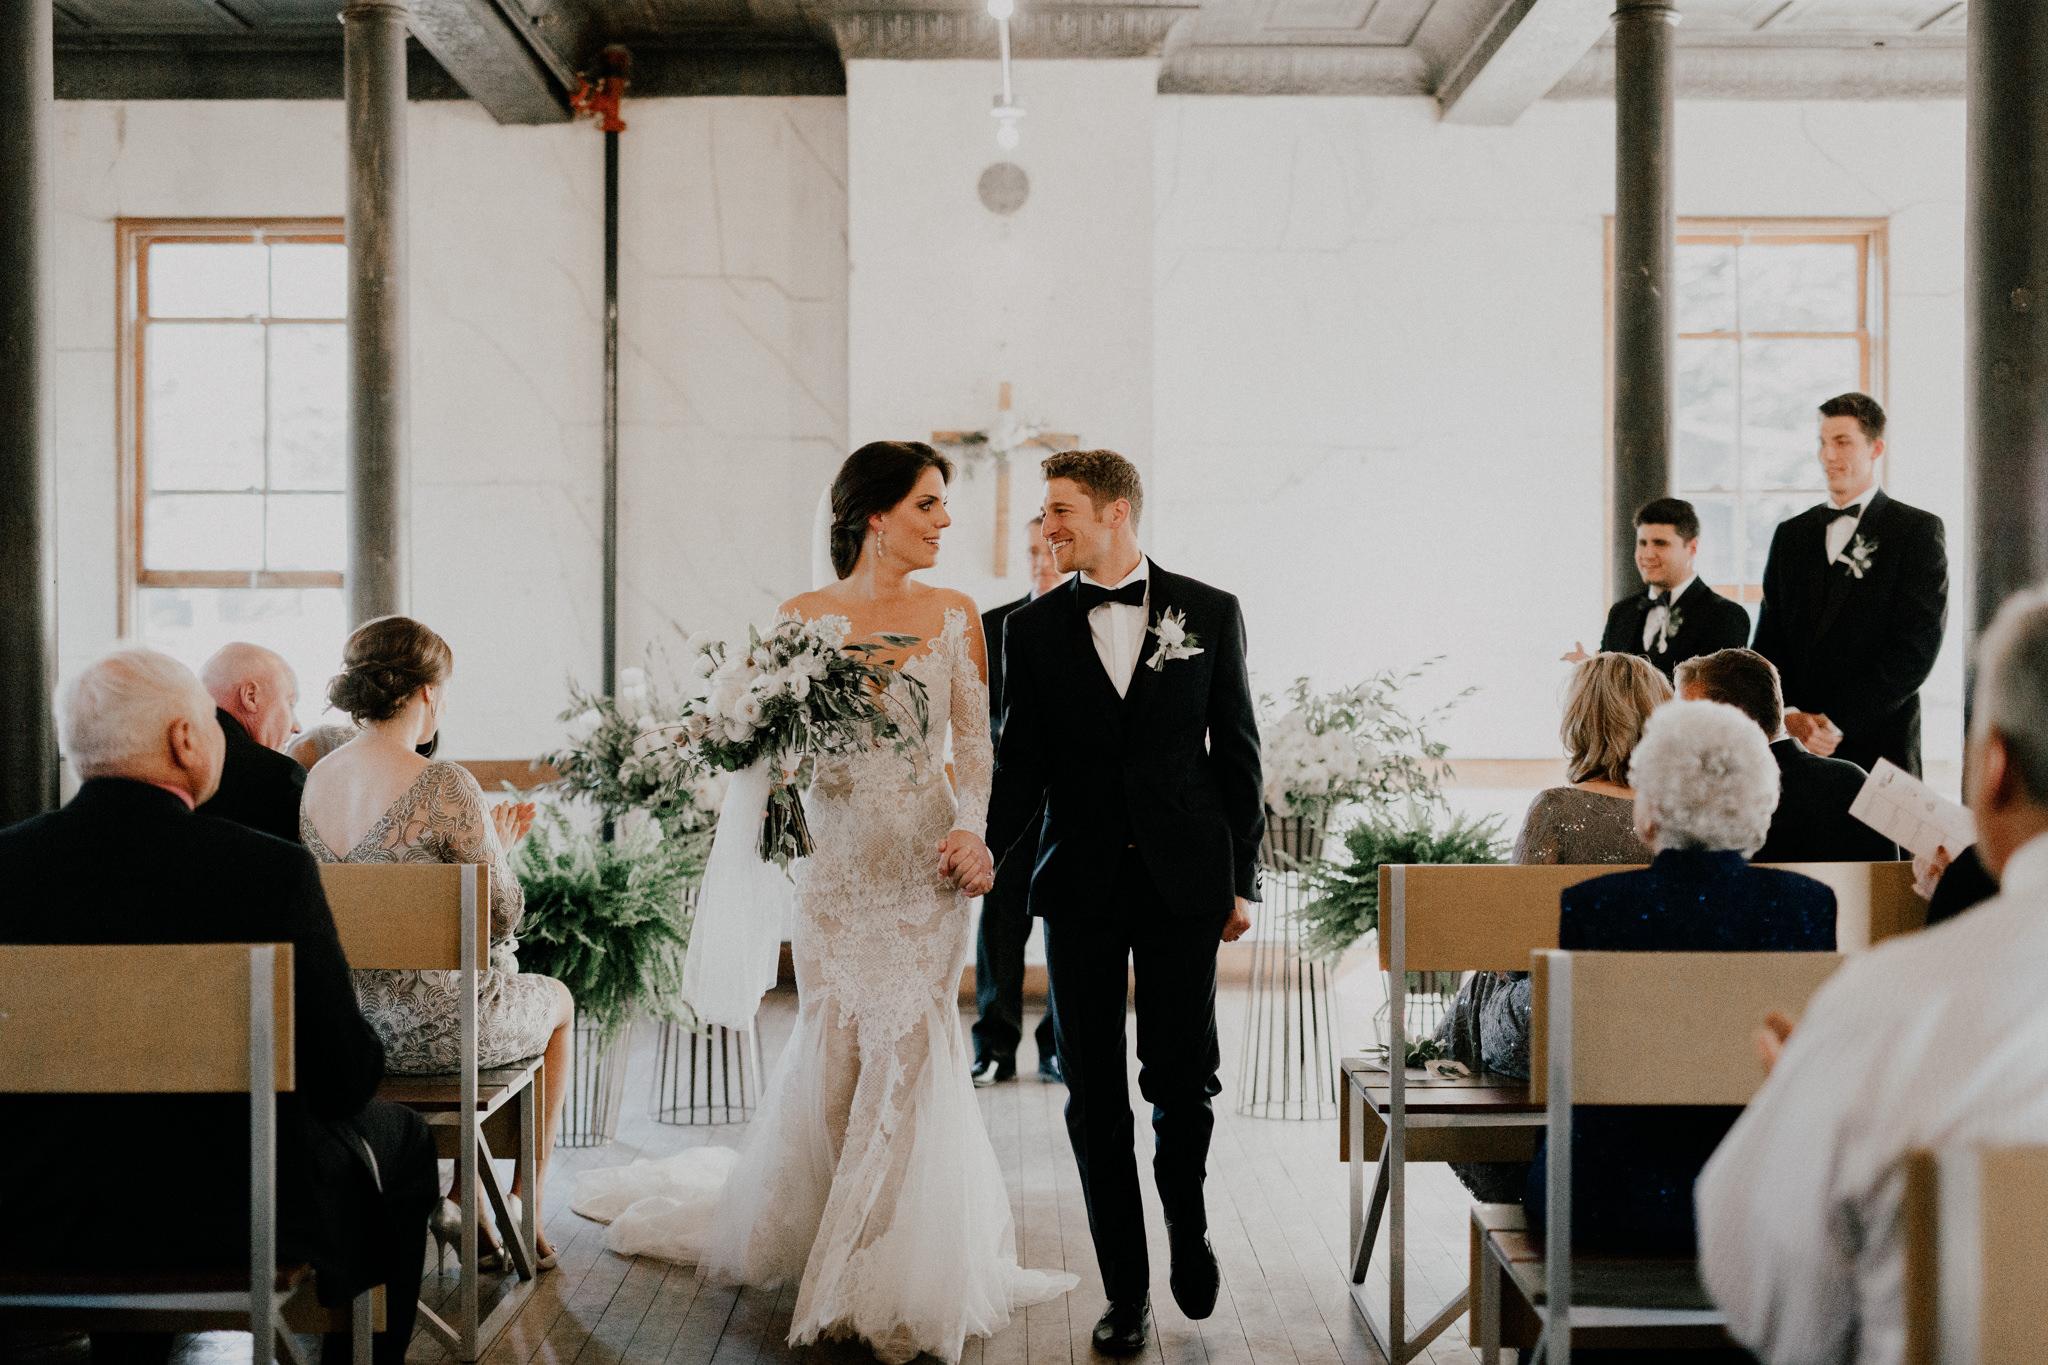 wedding-headlands-center-for-the-arts-sausalito-85.jpg